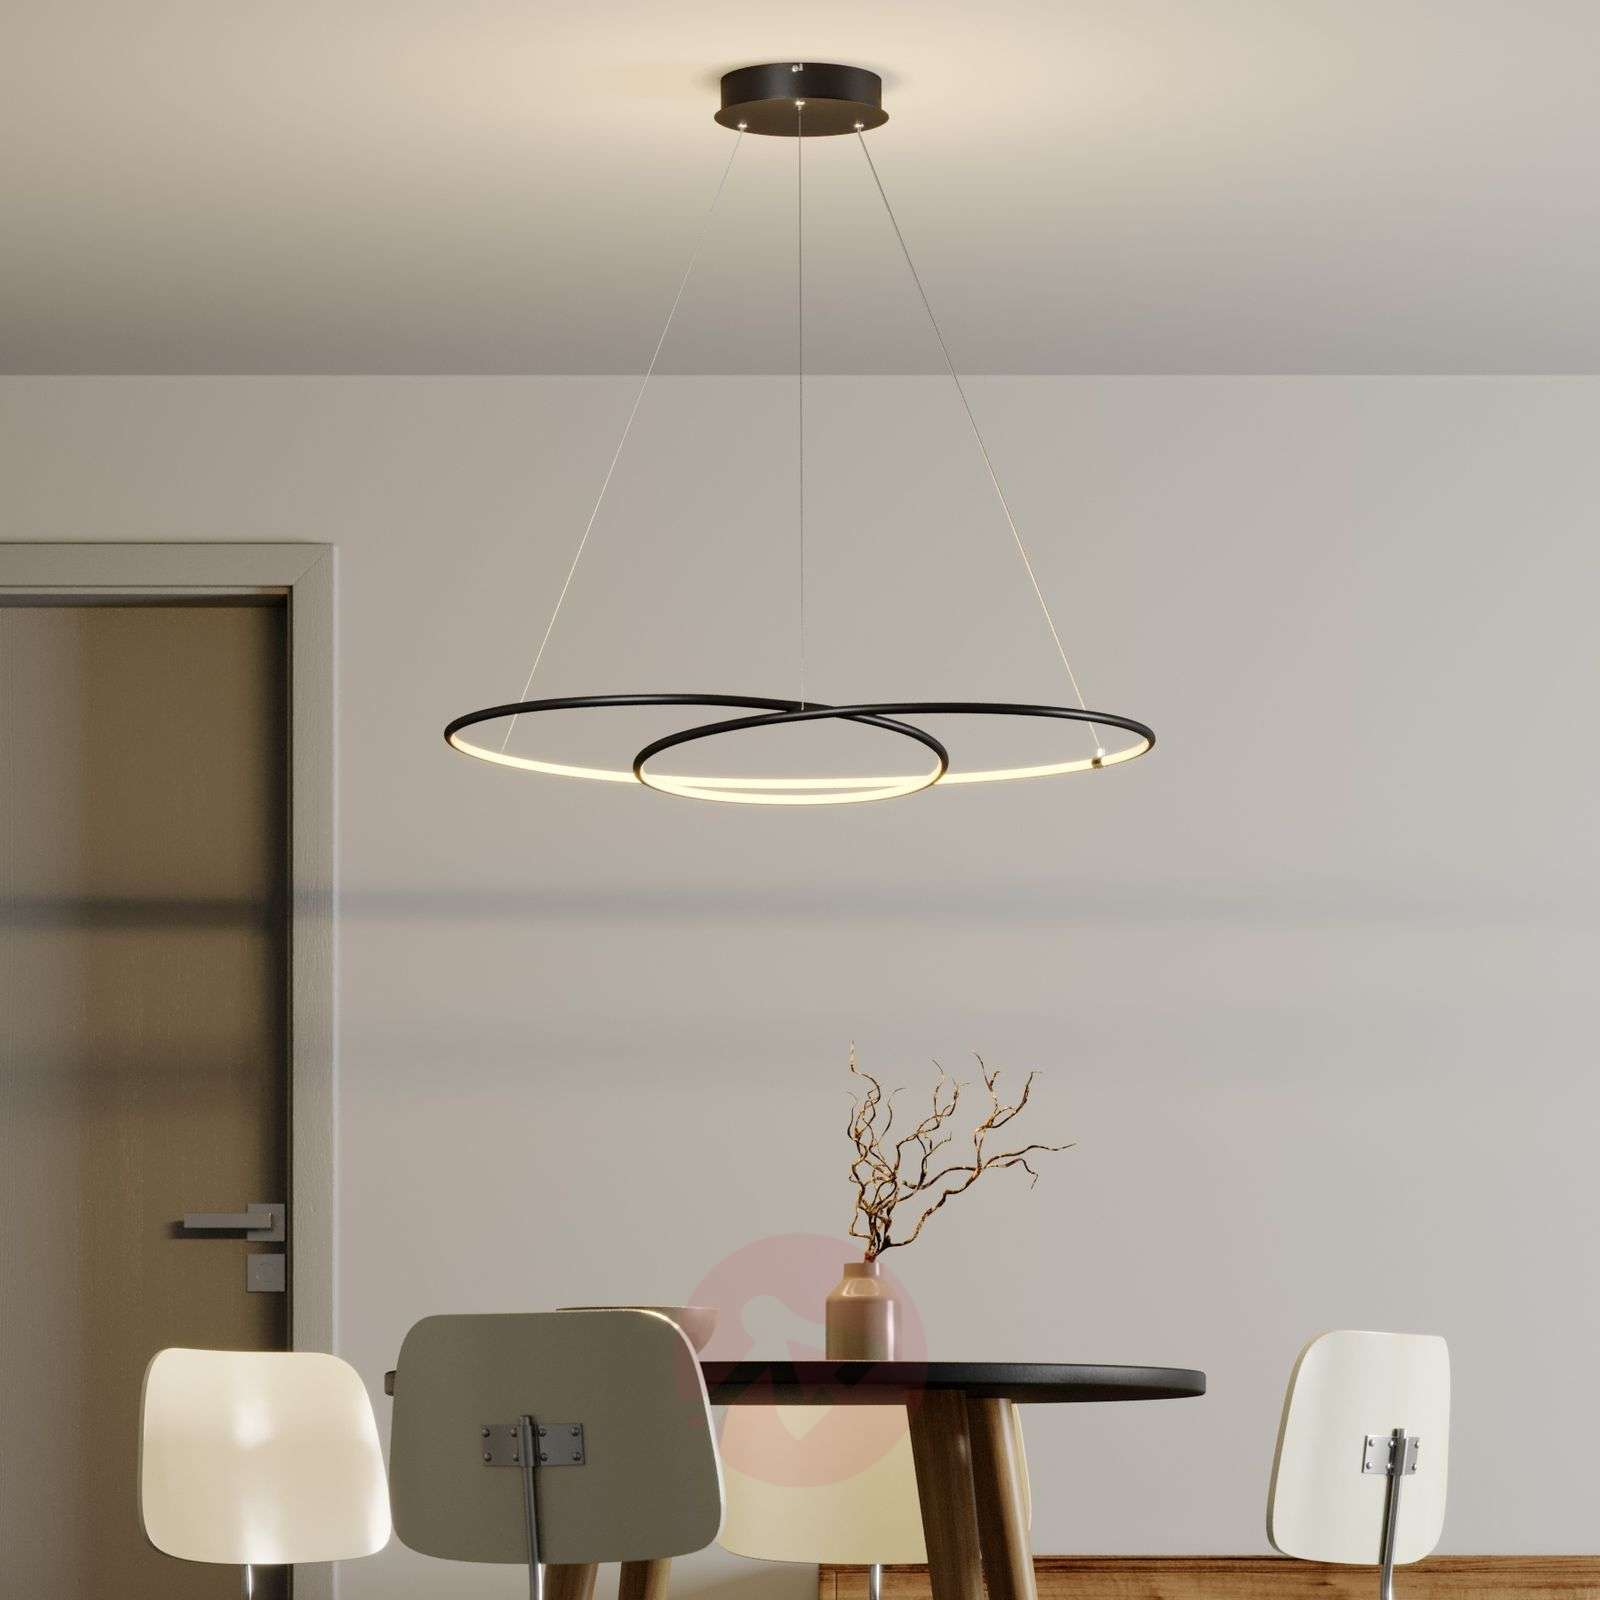 Lindby Lucy LED-riippuvalaisin, 90 cm, matta musta-9639146-02